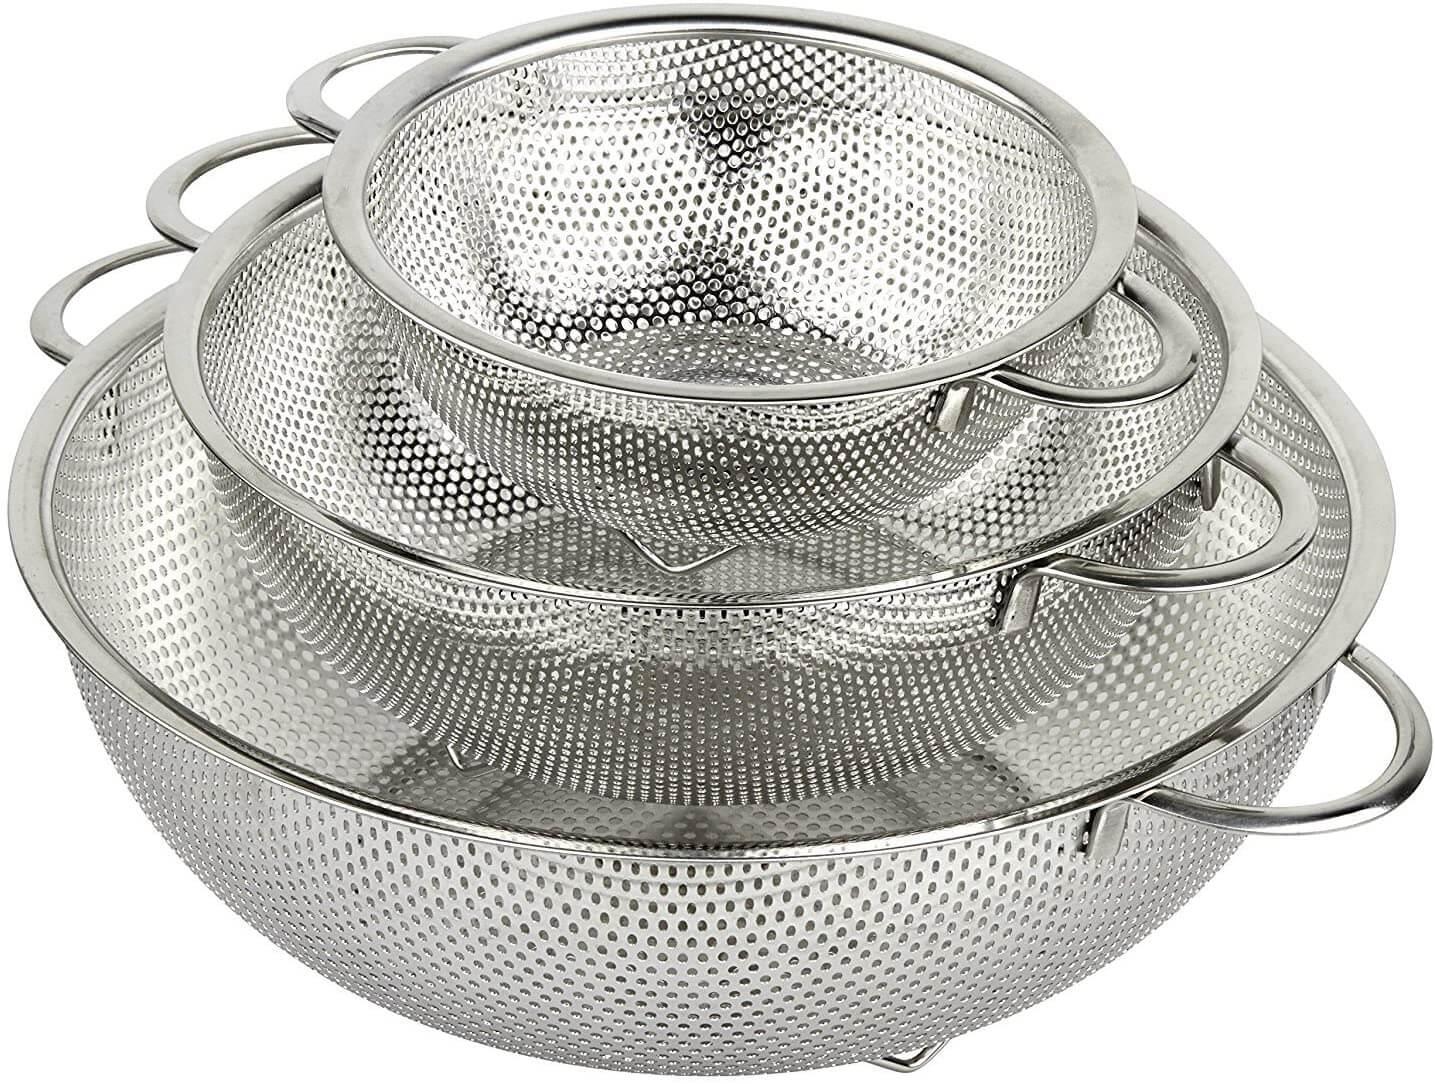 HÖLM 3-Piece Stainless Steel Mesh Micro-Perforated Strainer Colander Set